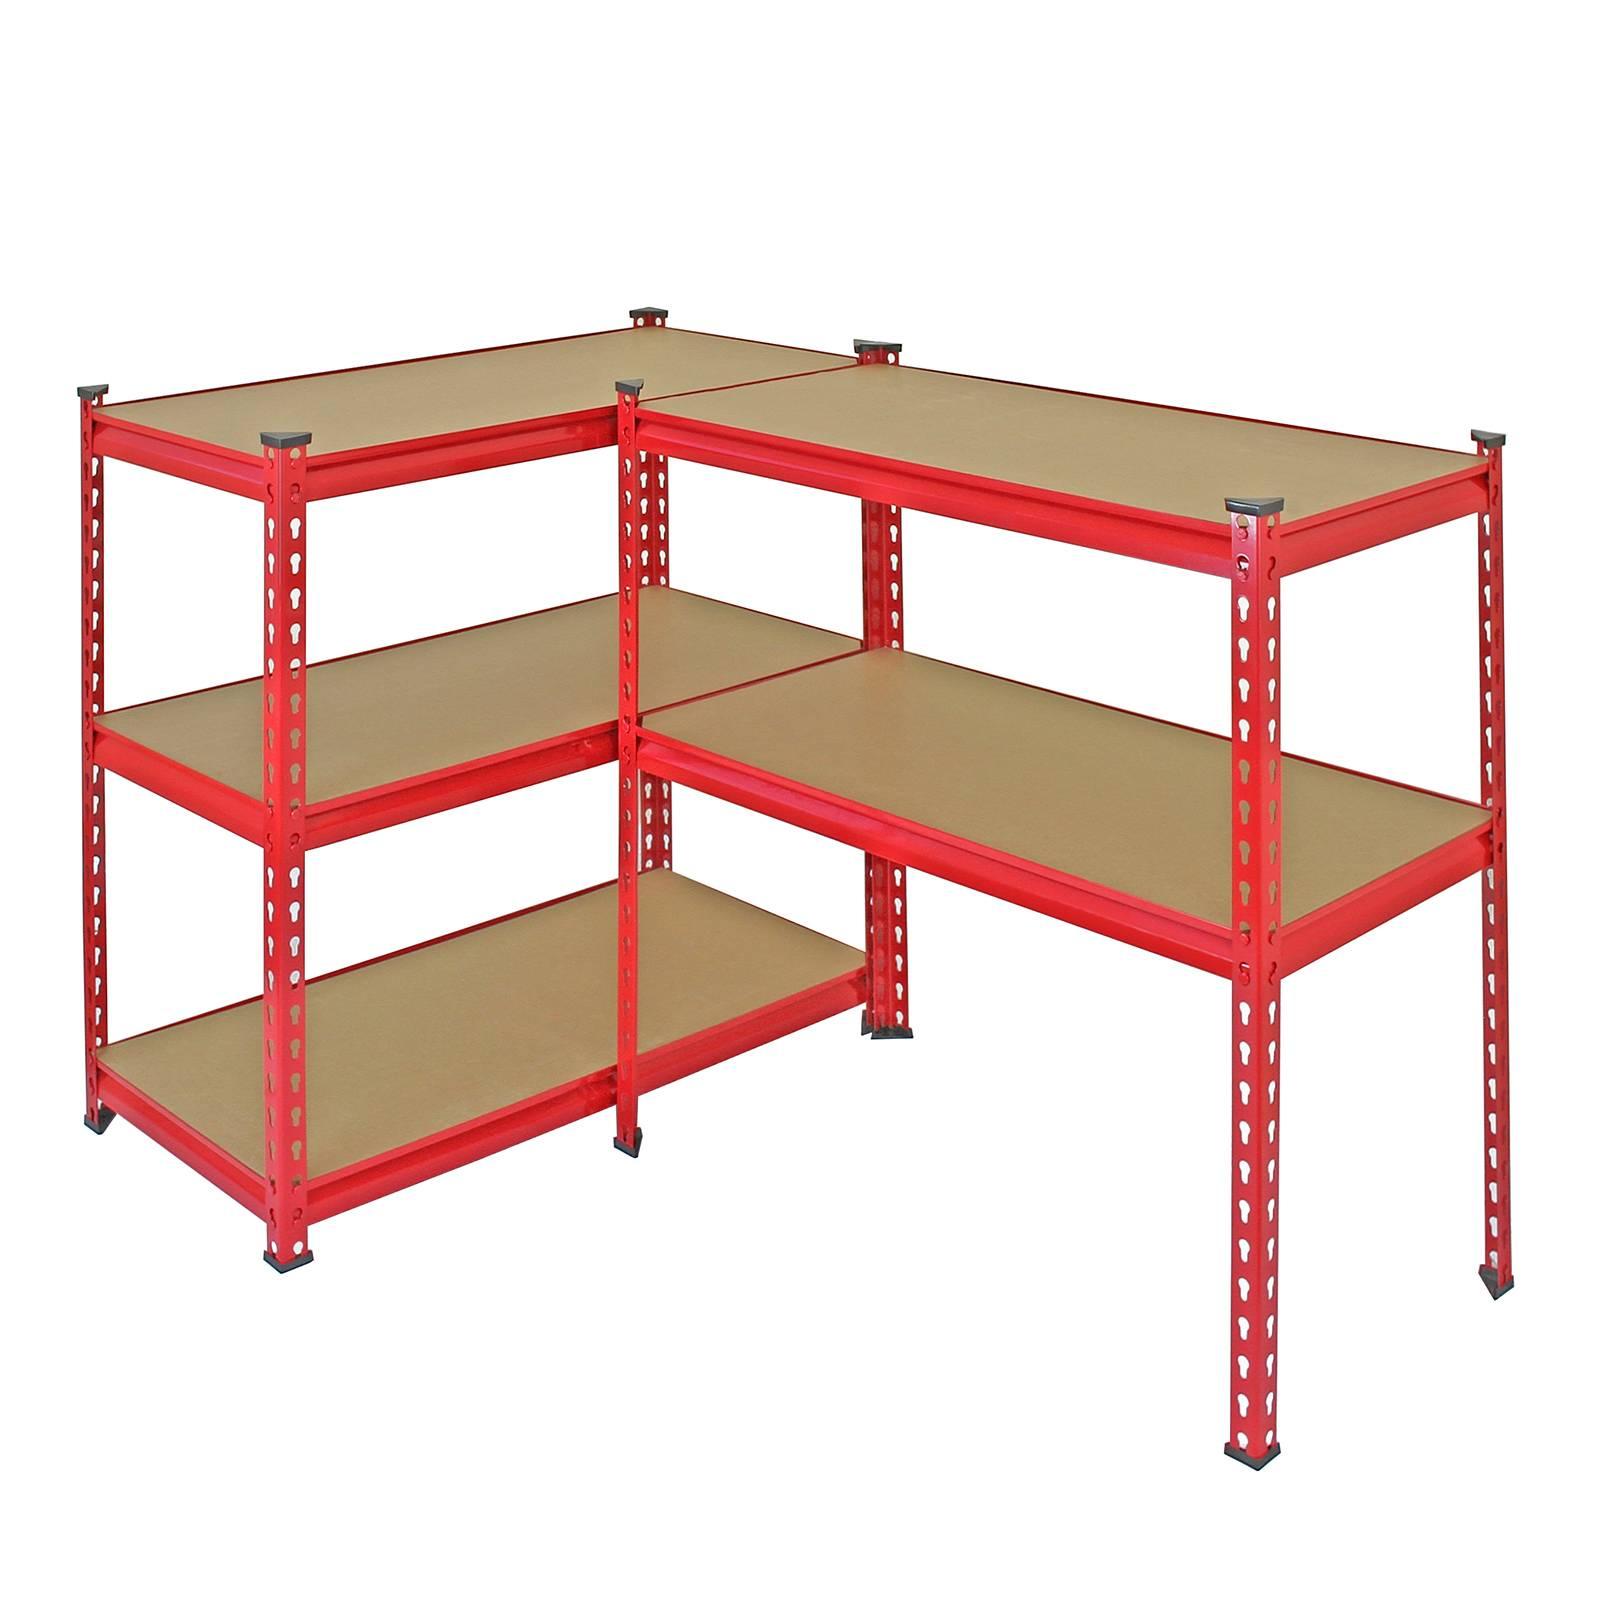 Heavy Duty Garage Shelf : Garage shelving racking cm storage units heavy duty